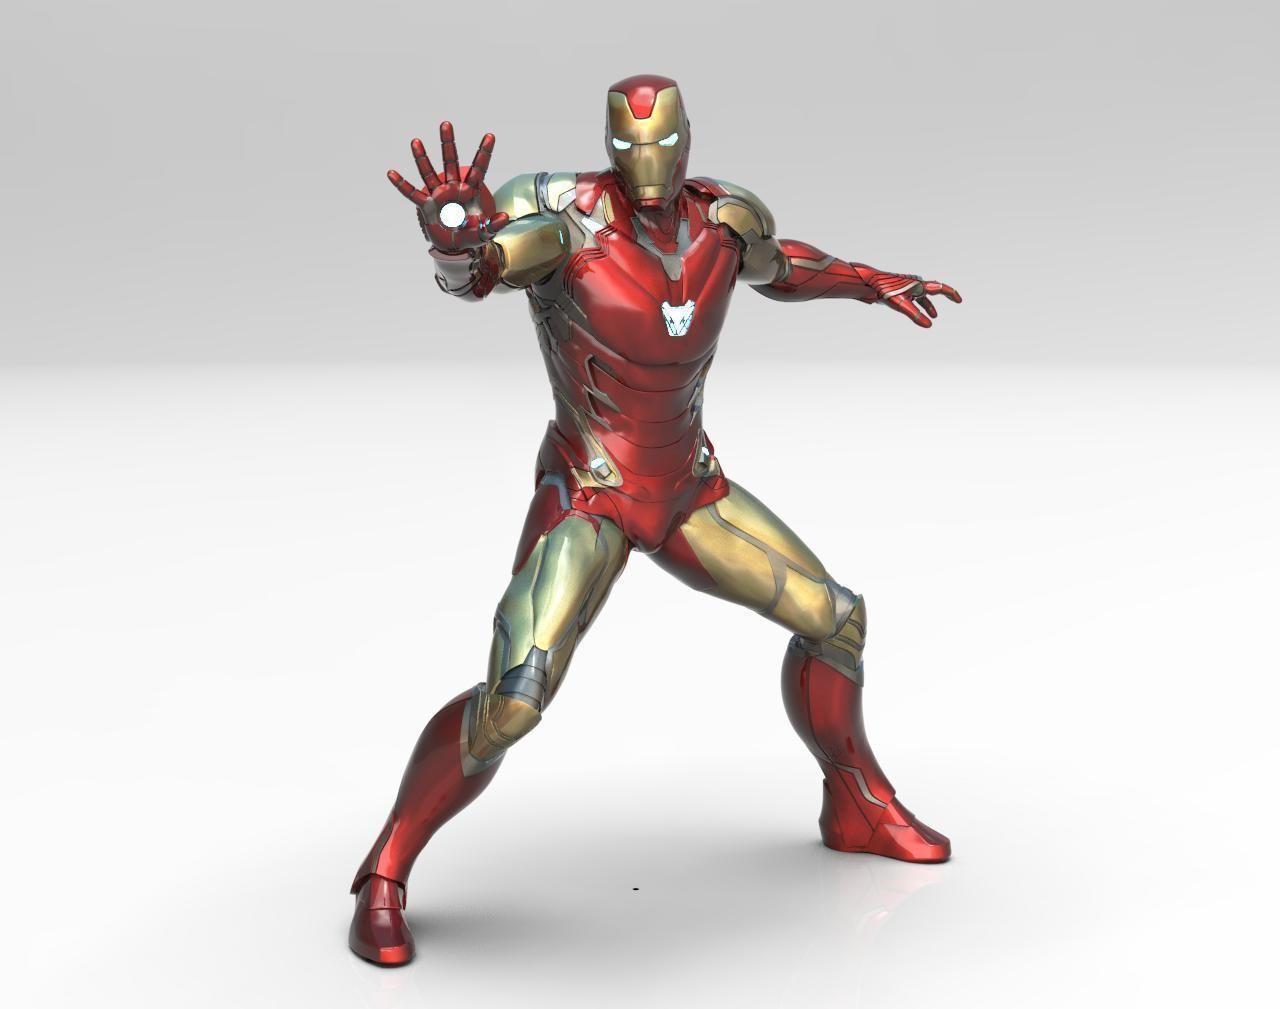 Iron Man MK85 Pose Statue 3D Print Ready